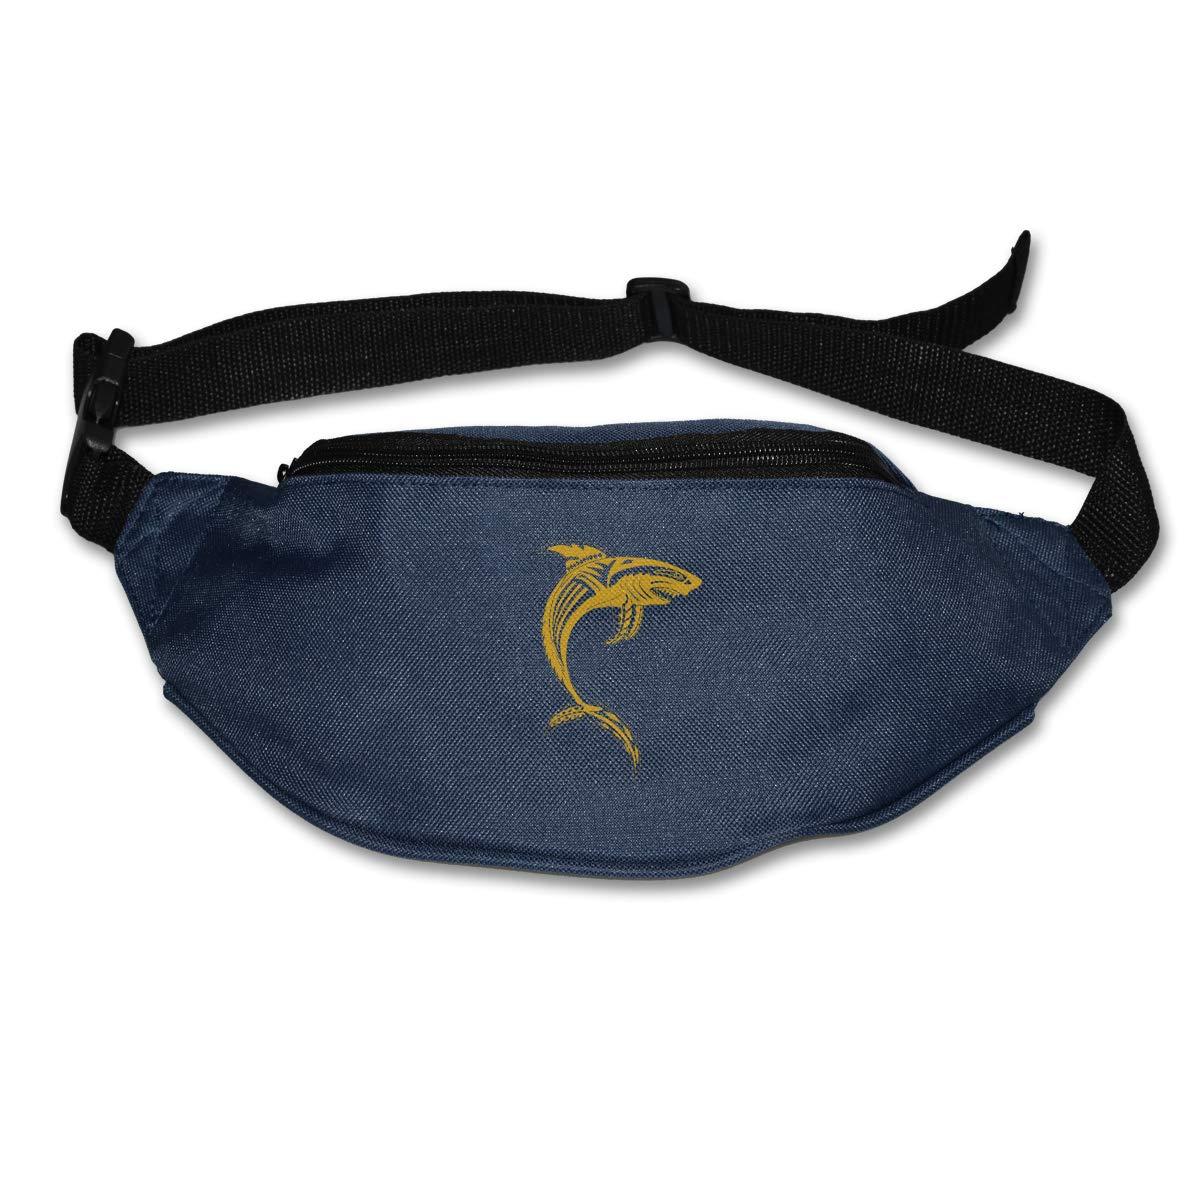 Yellow Shark Sport Waist Bag Fanny Pack Adjustable For Travel